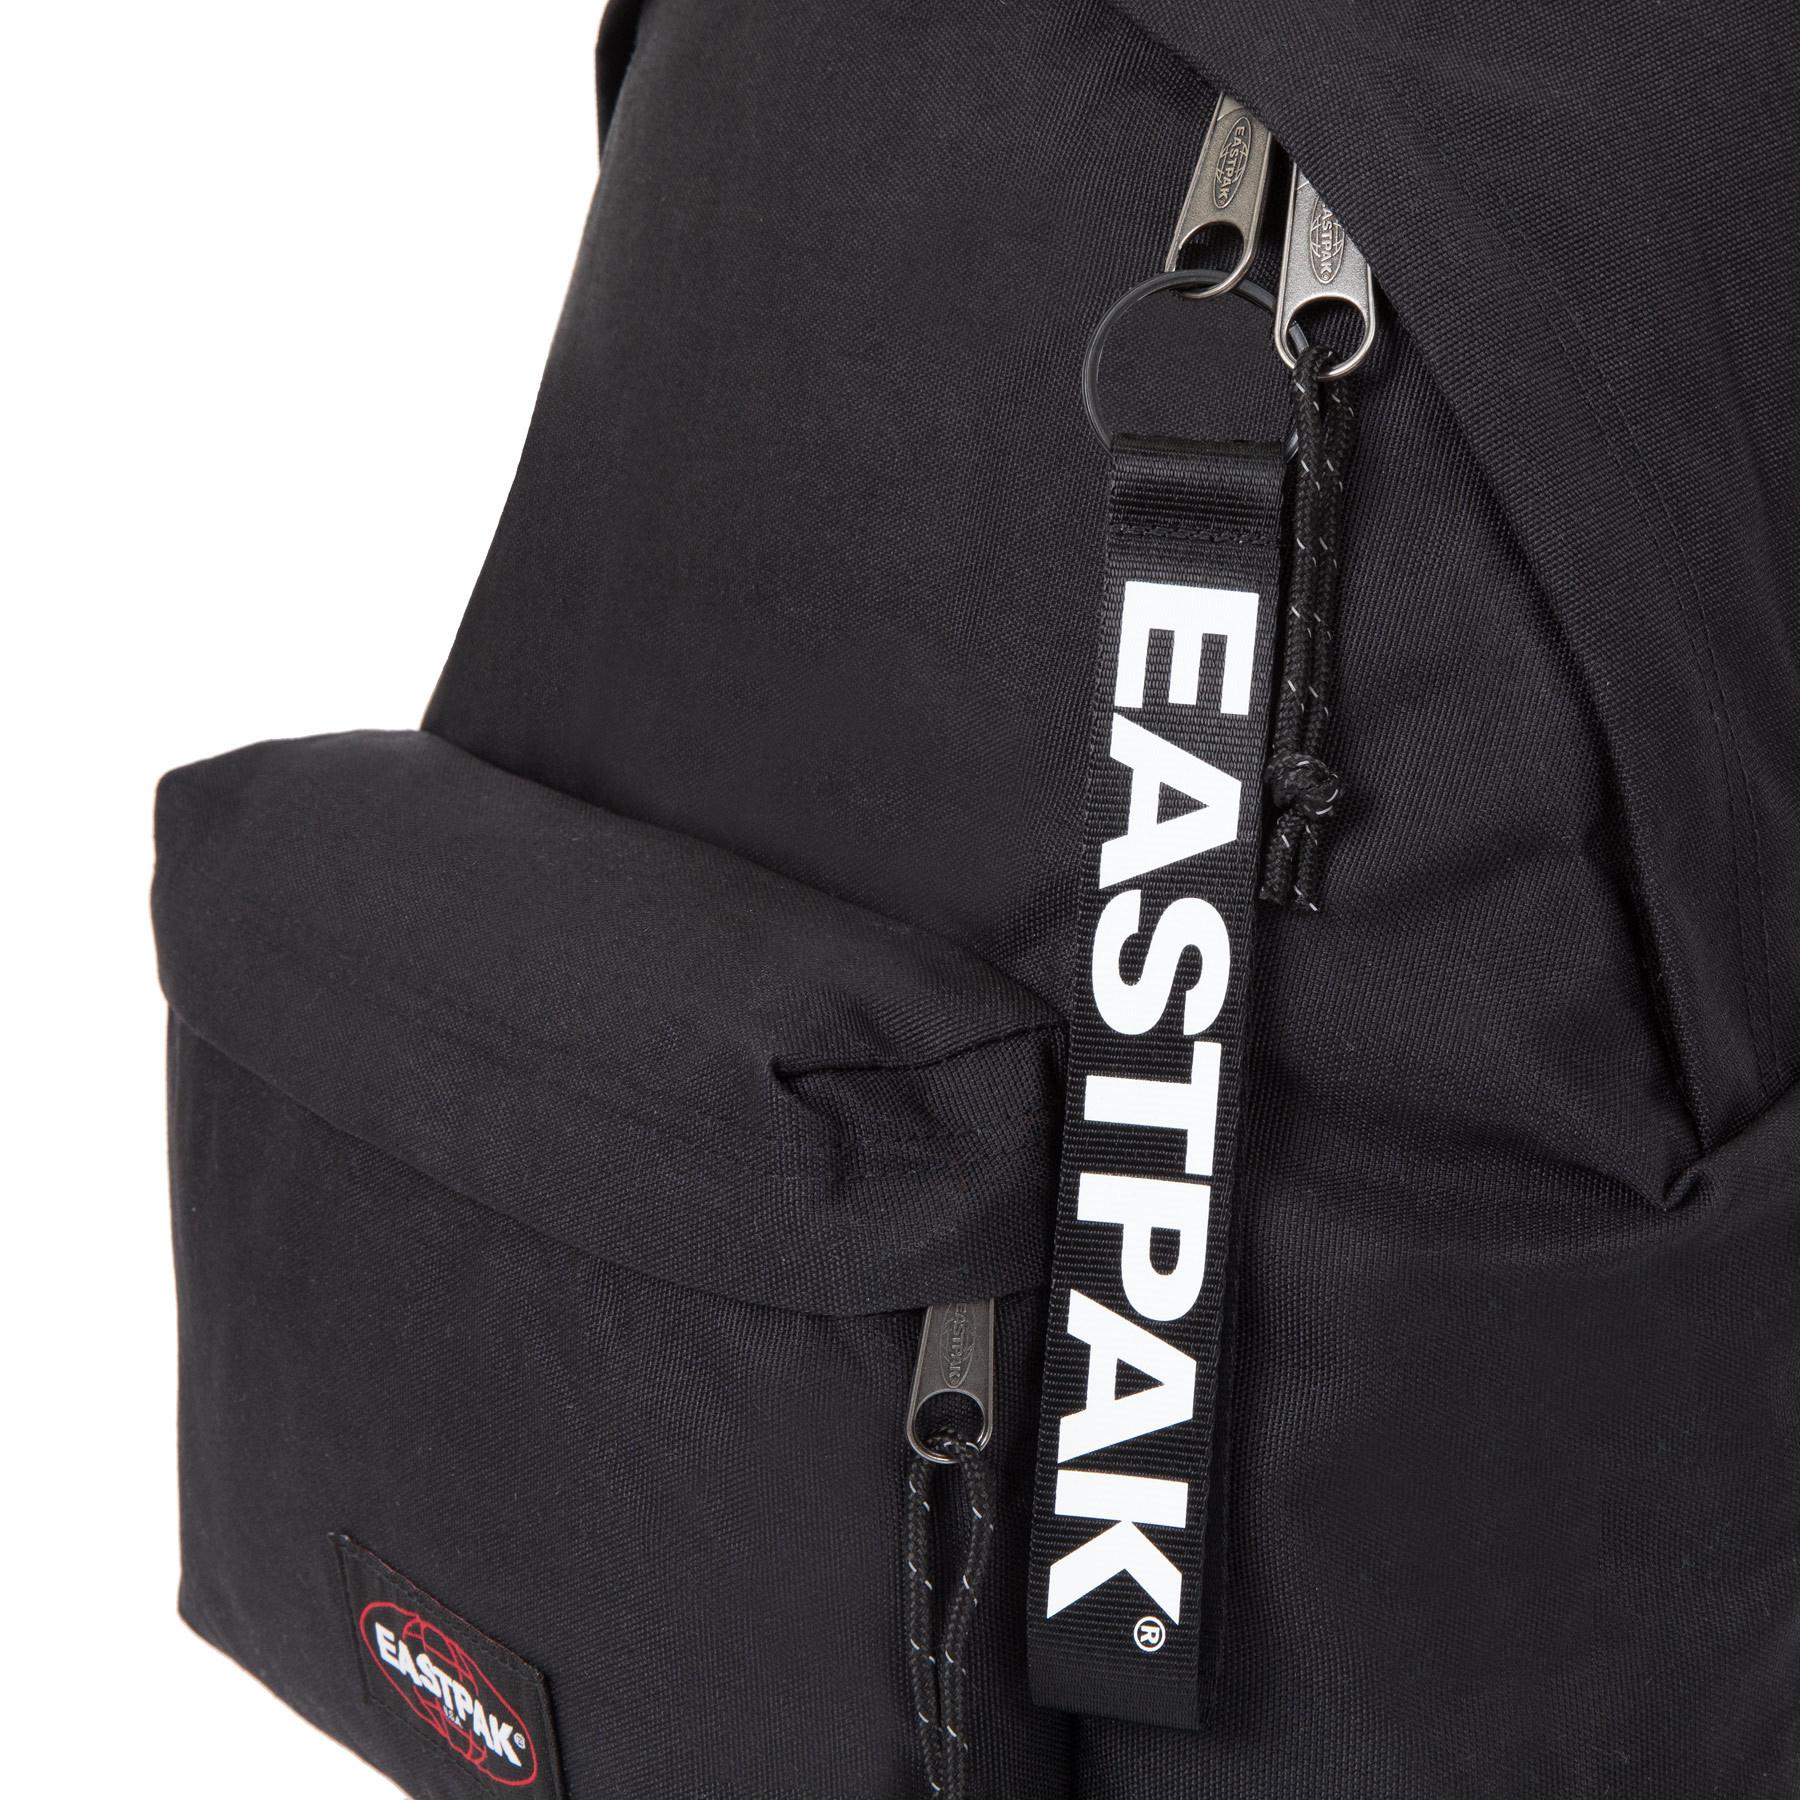 Eastpak Eastpak Padded Pak'r Black - SPECIAL EDITION - Puller - Exclusieve uitgave